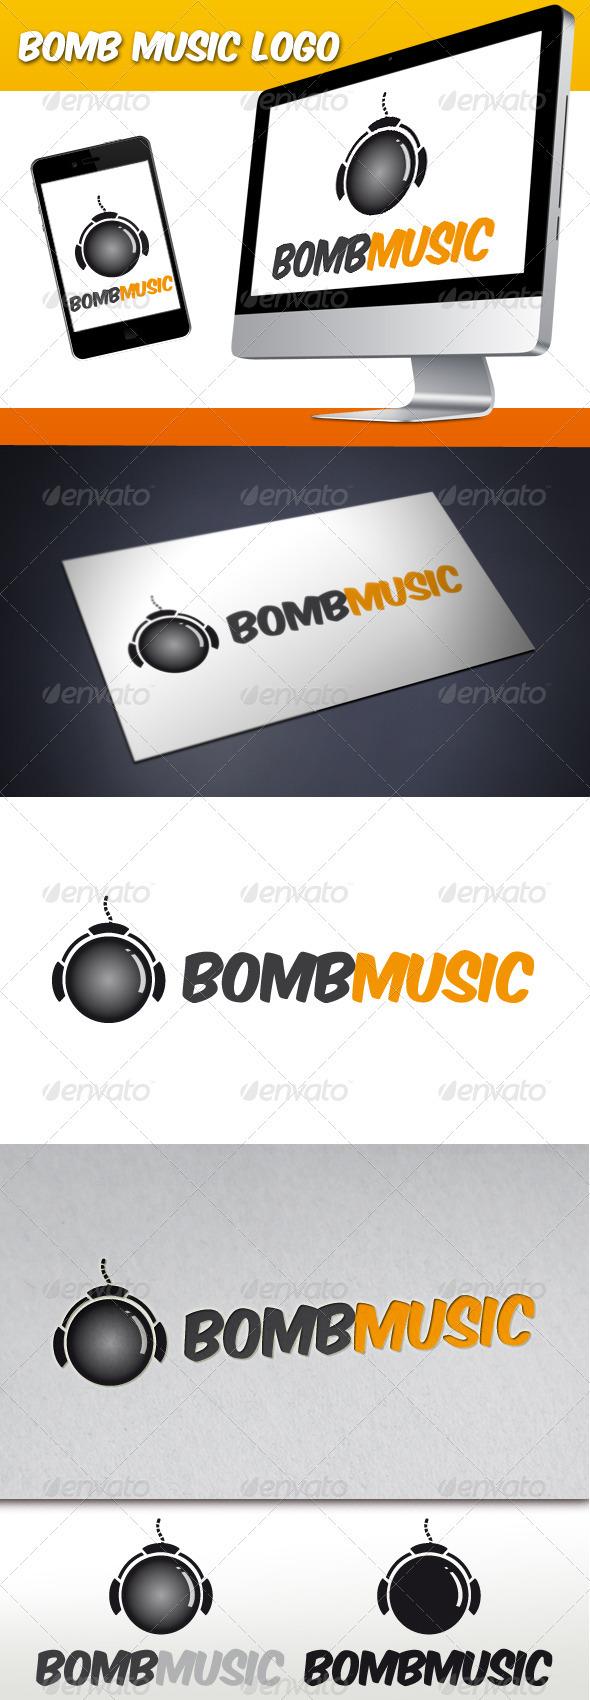 GraphicRiver Bomb Music Logo 3373576